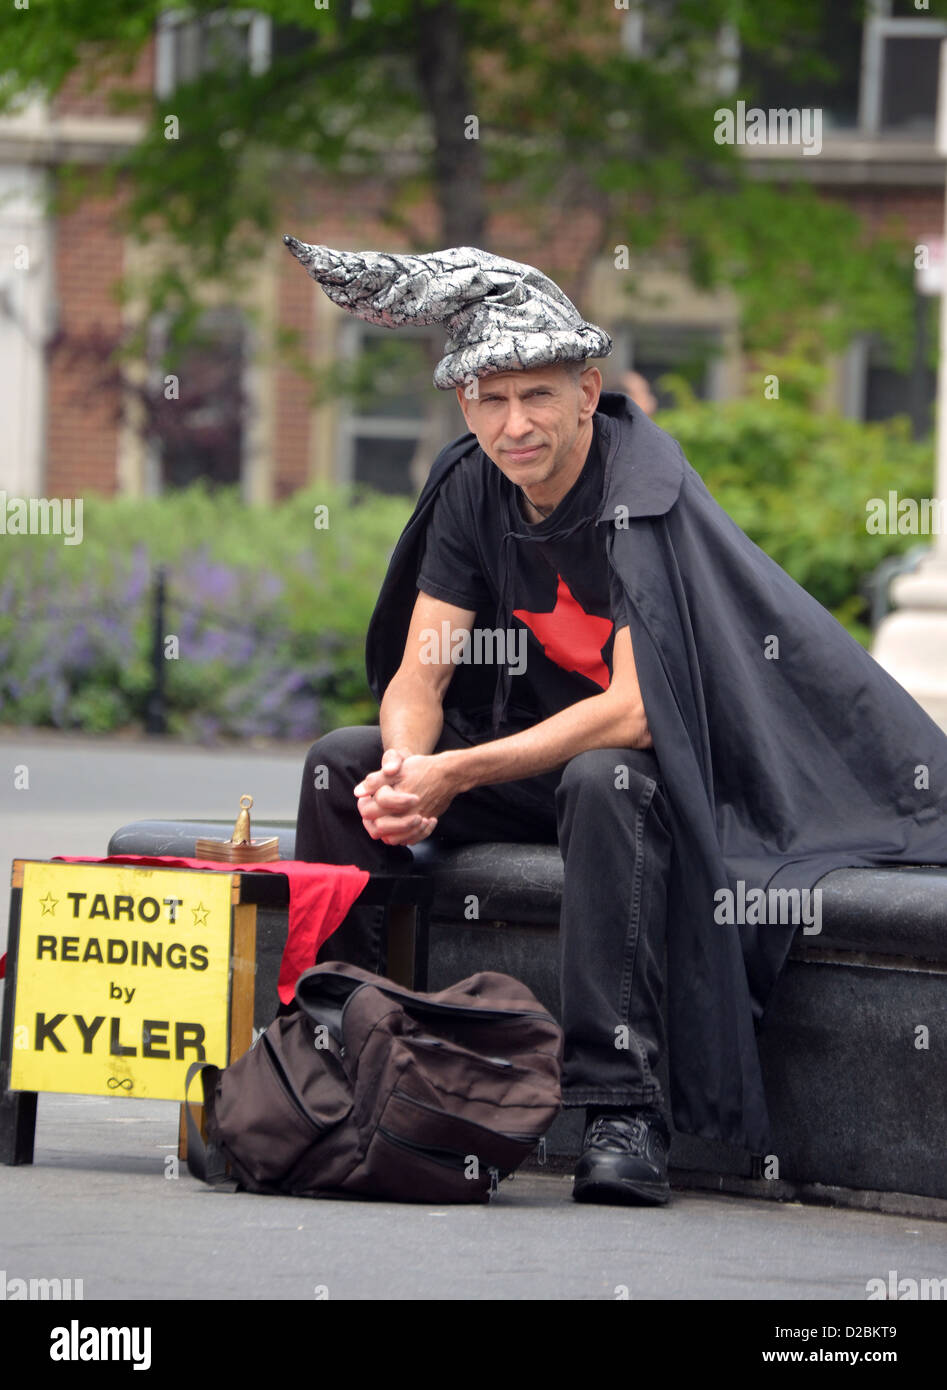 Tarot card reader Kyler in Washington Square Park in Greenwich Village, New York City Stock Photo